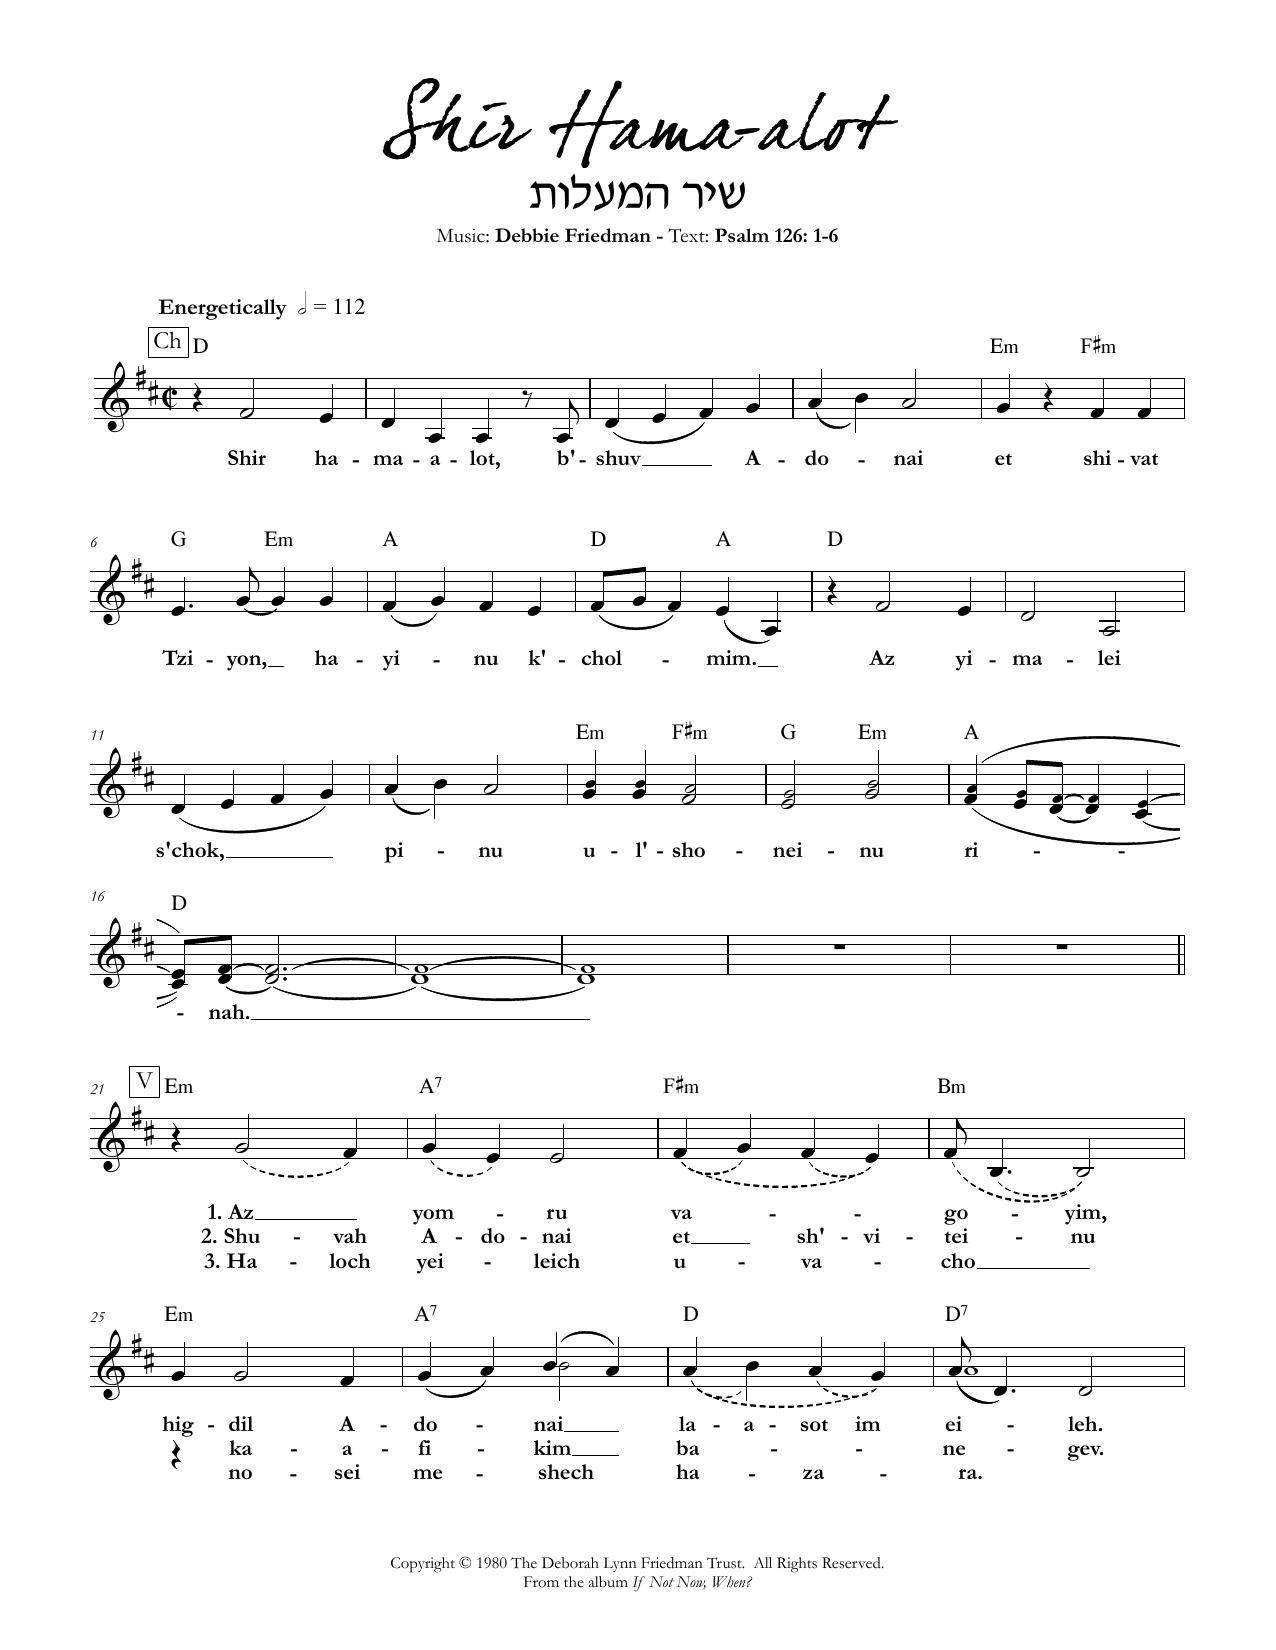 Shir Hama-a lot Sheet Music